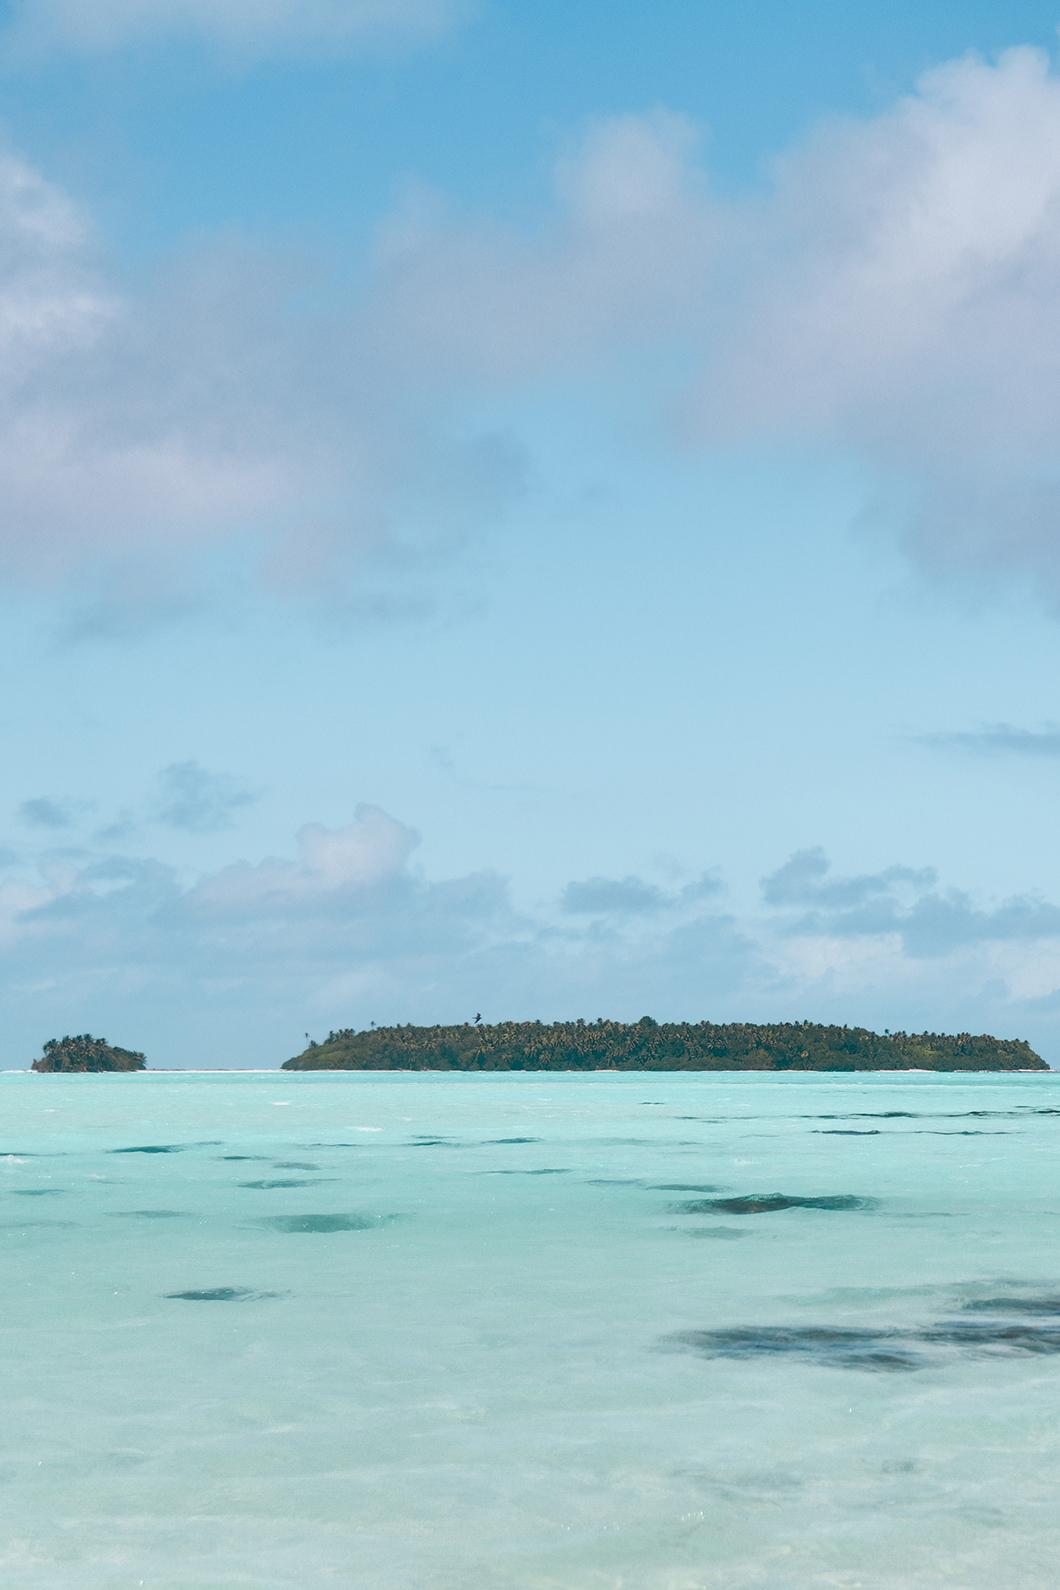 Découverte de Tetiaroa, un voyage de noce en Polynésie Française